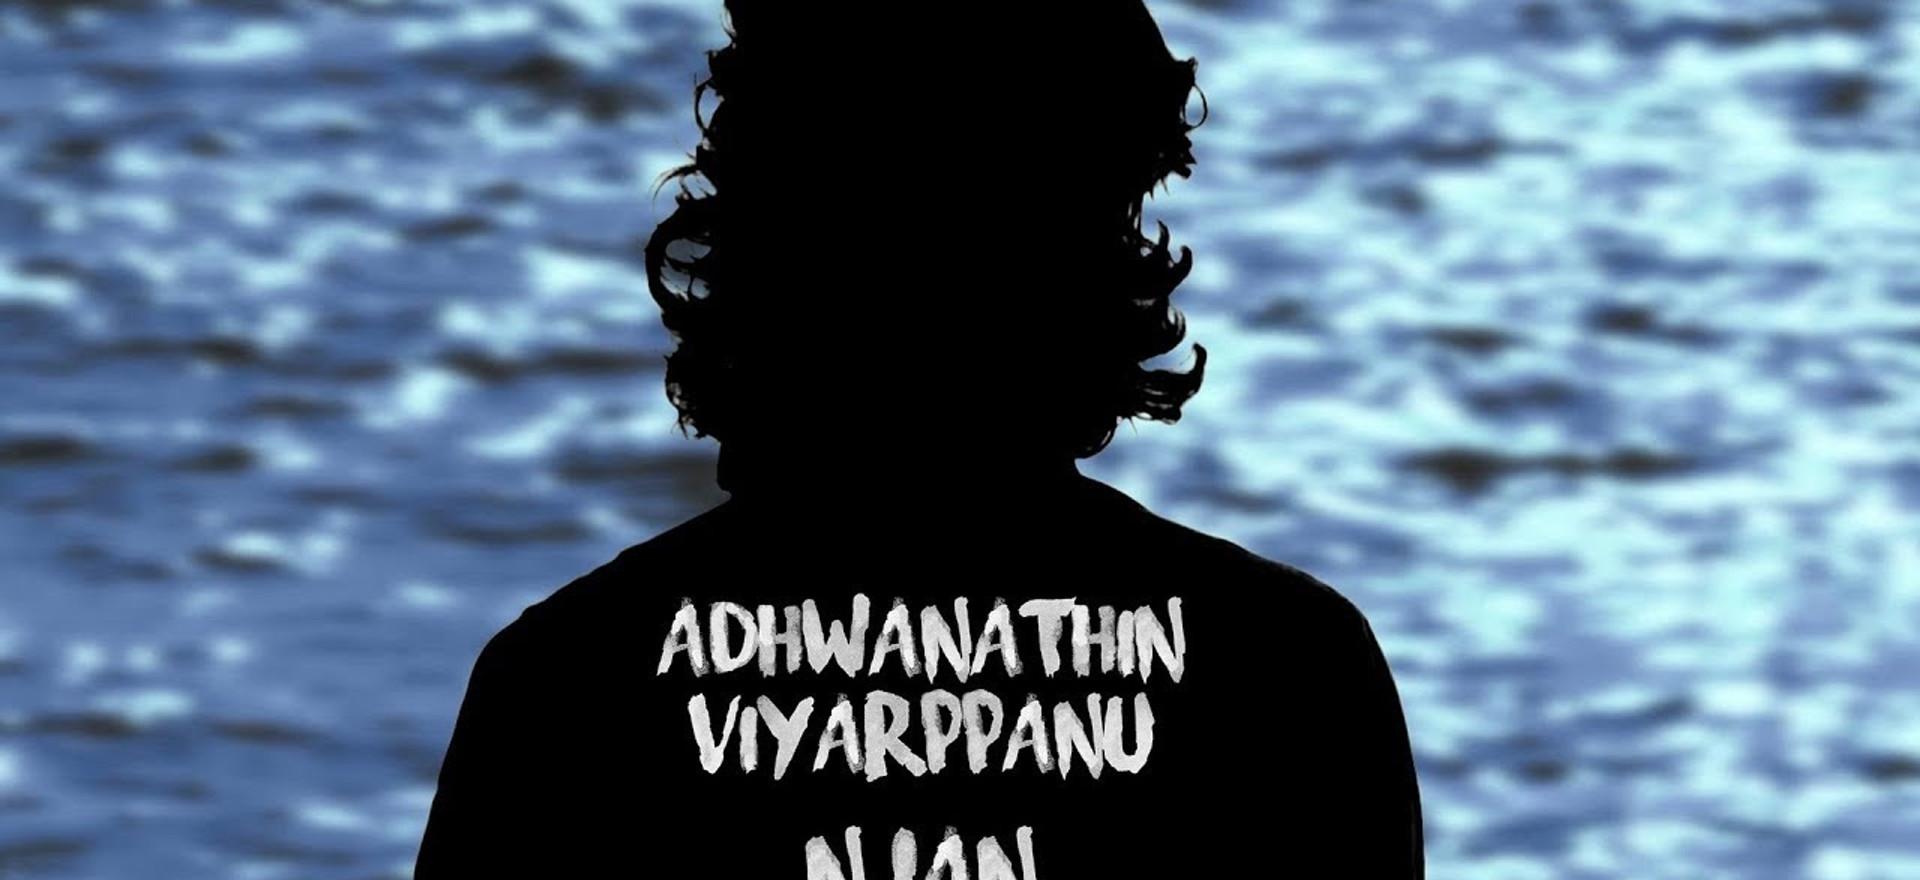 Adhwanathin Viyarppanu Njan | The Other Side | Sooraj Santhosh